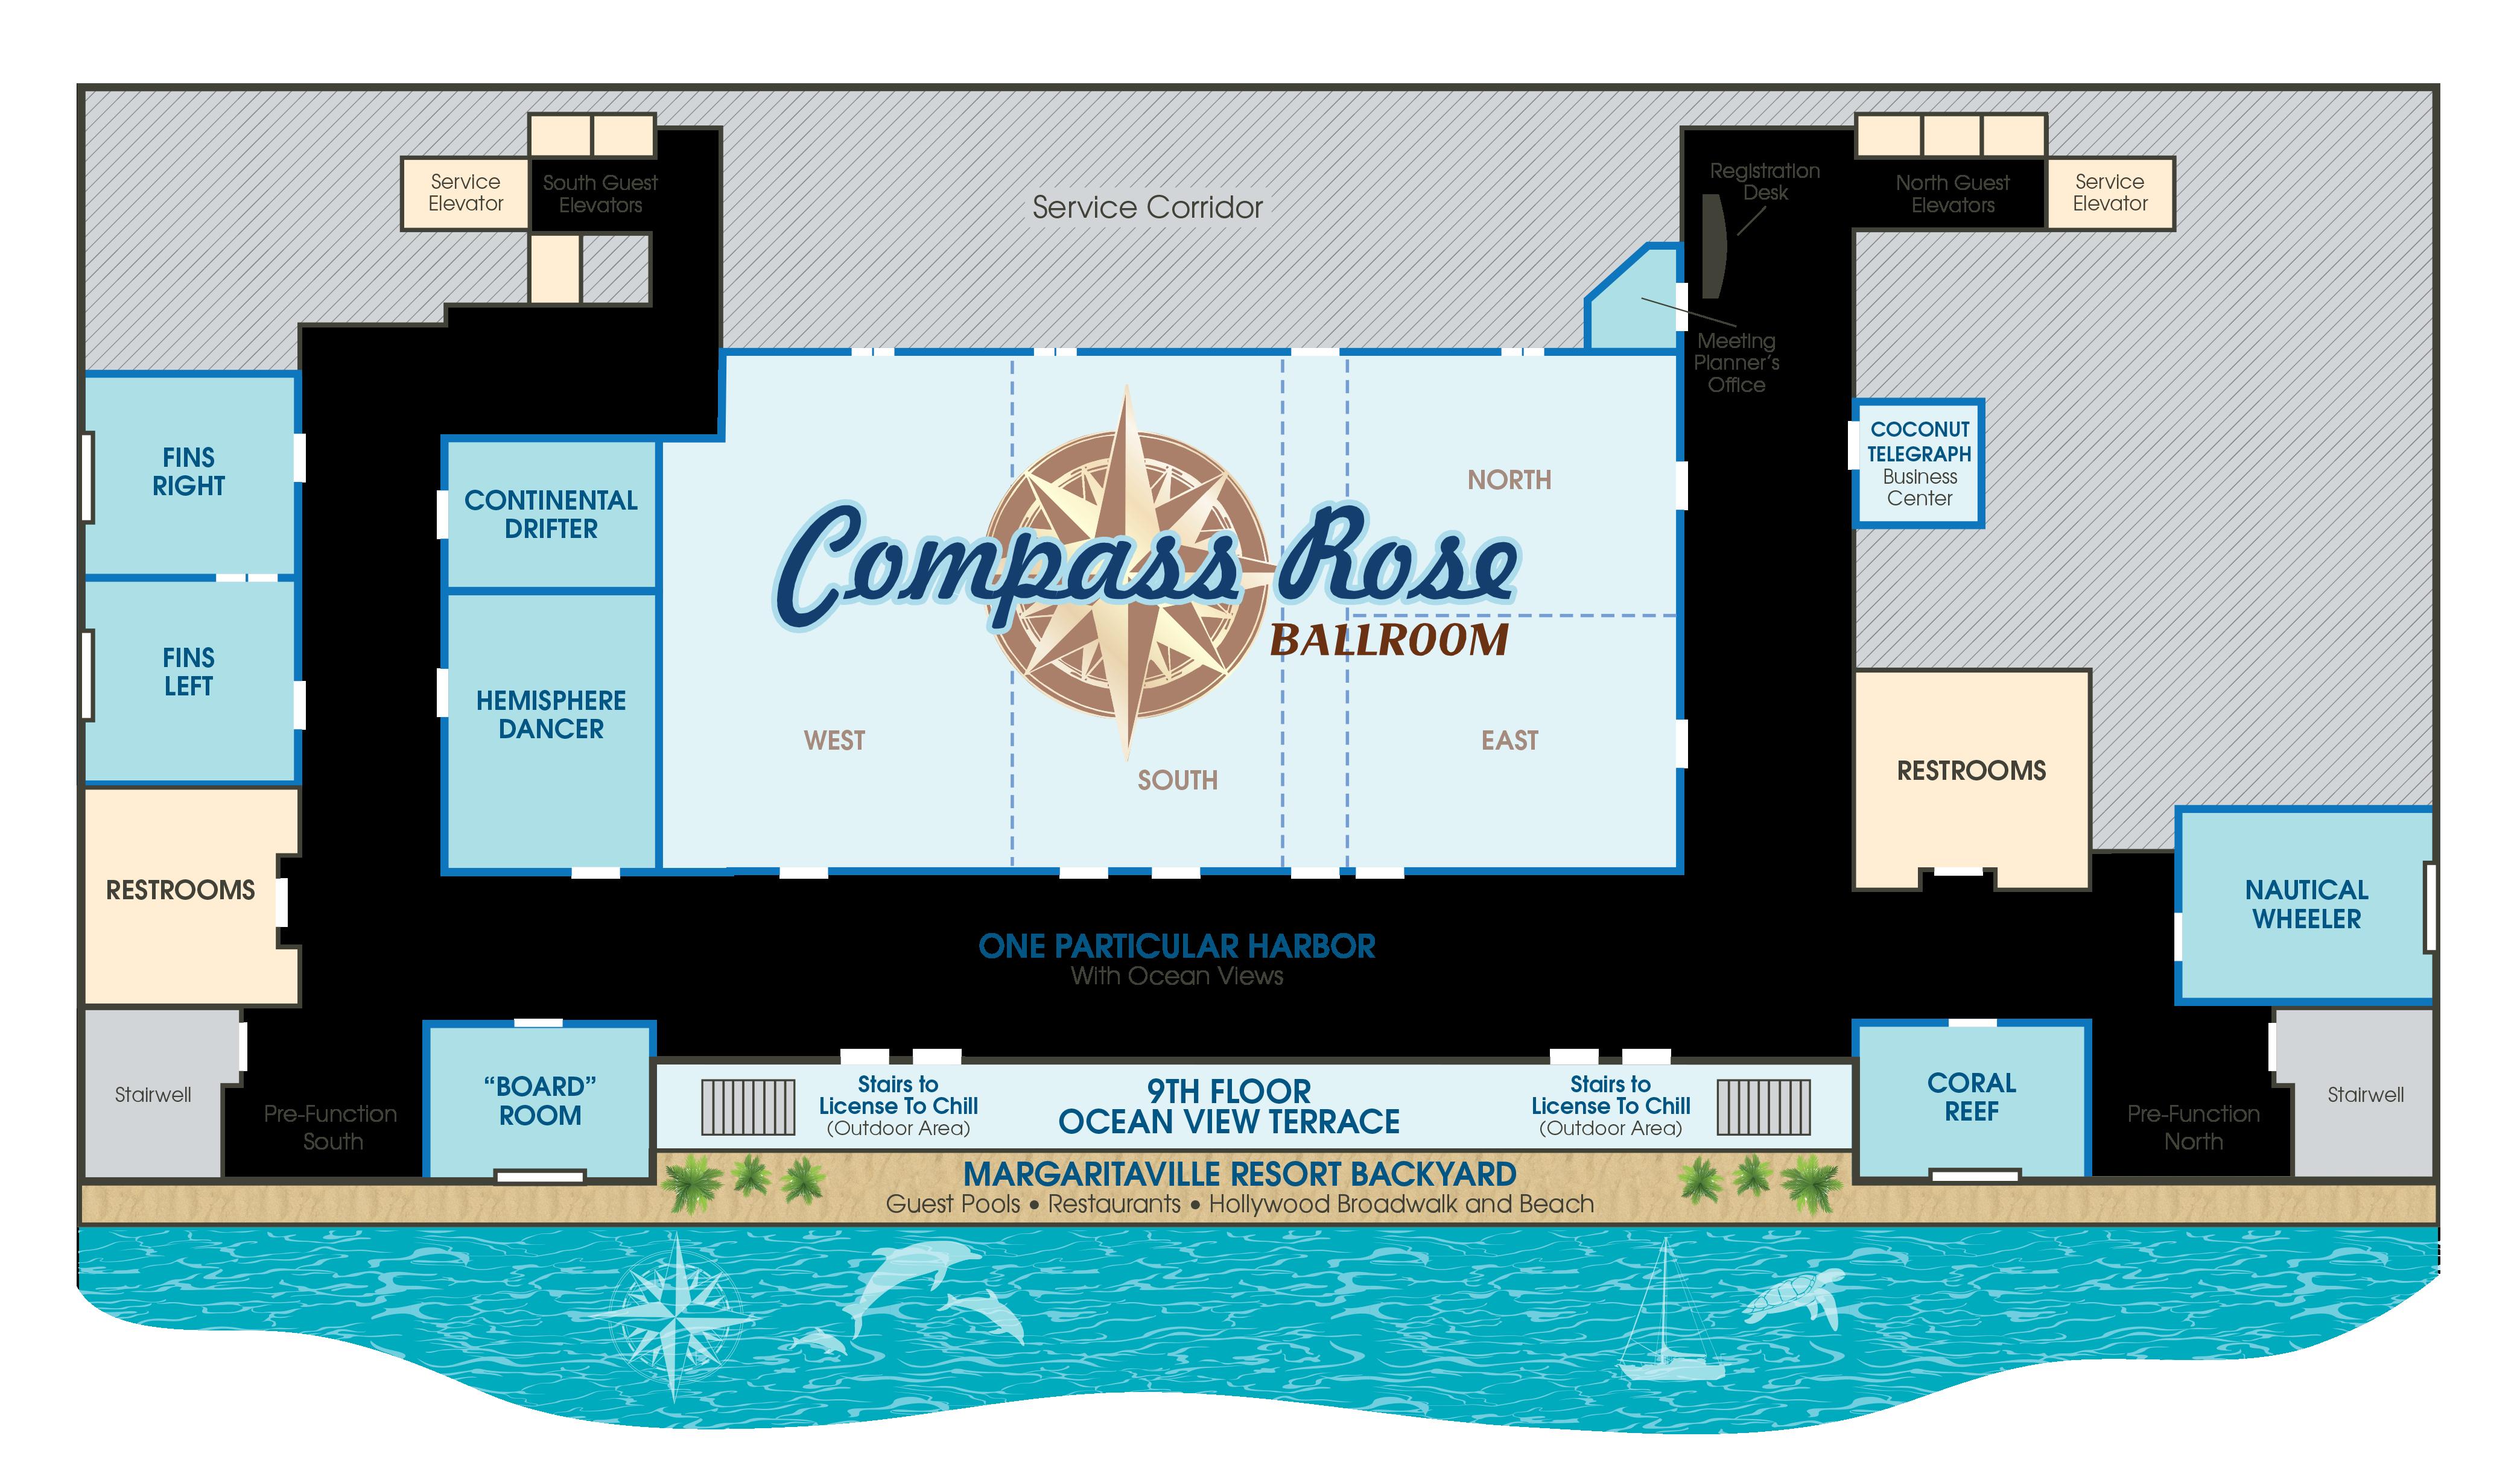 image of compass ballroom layout